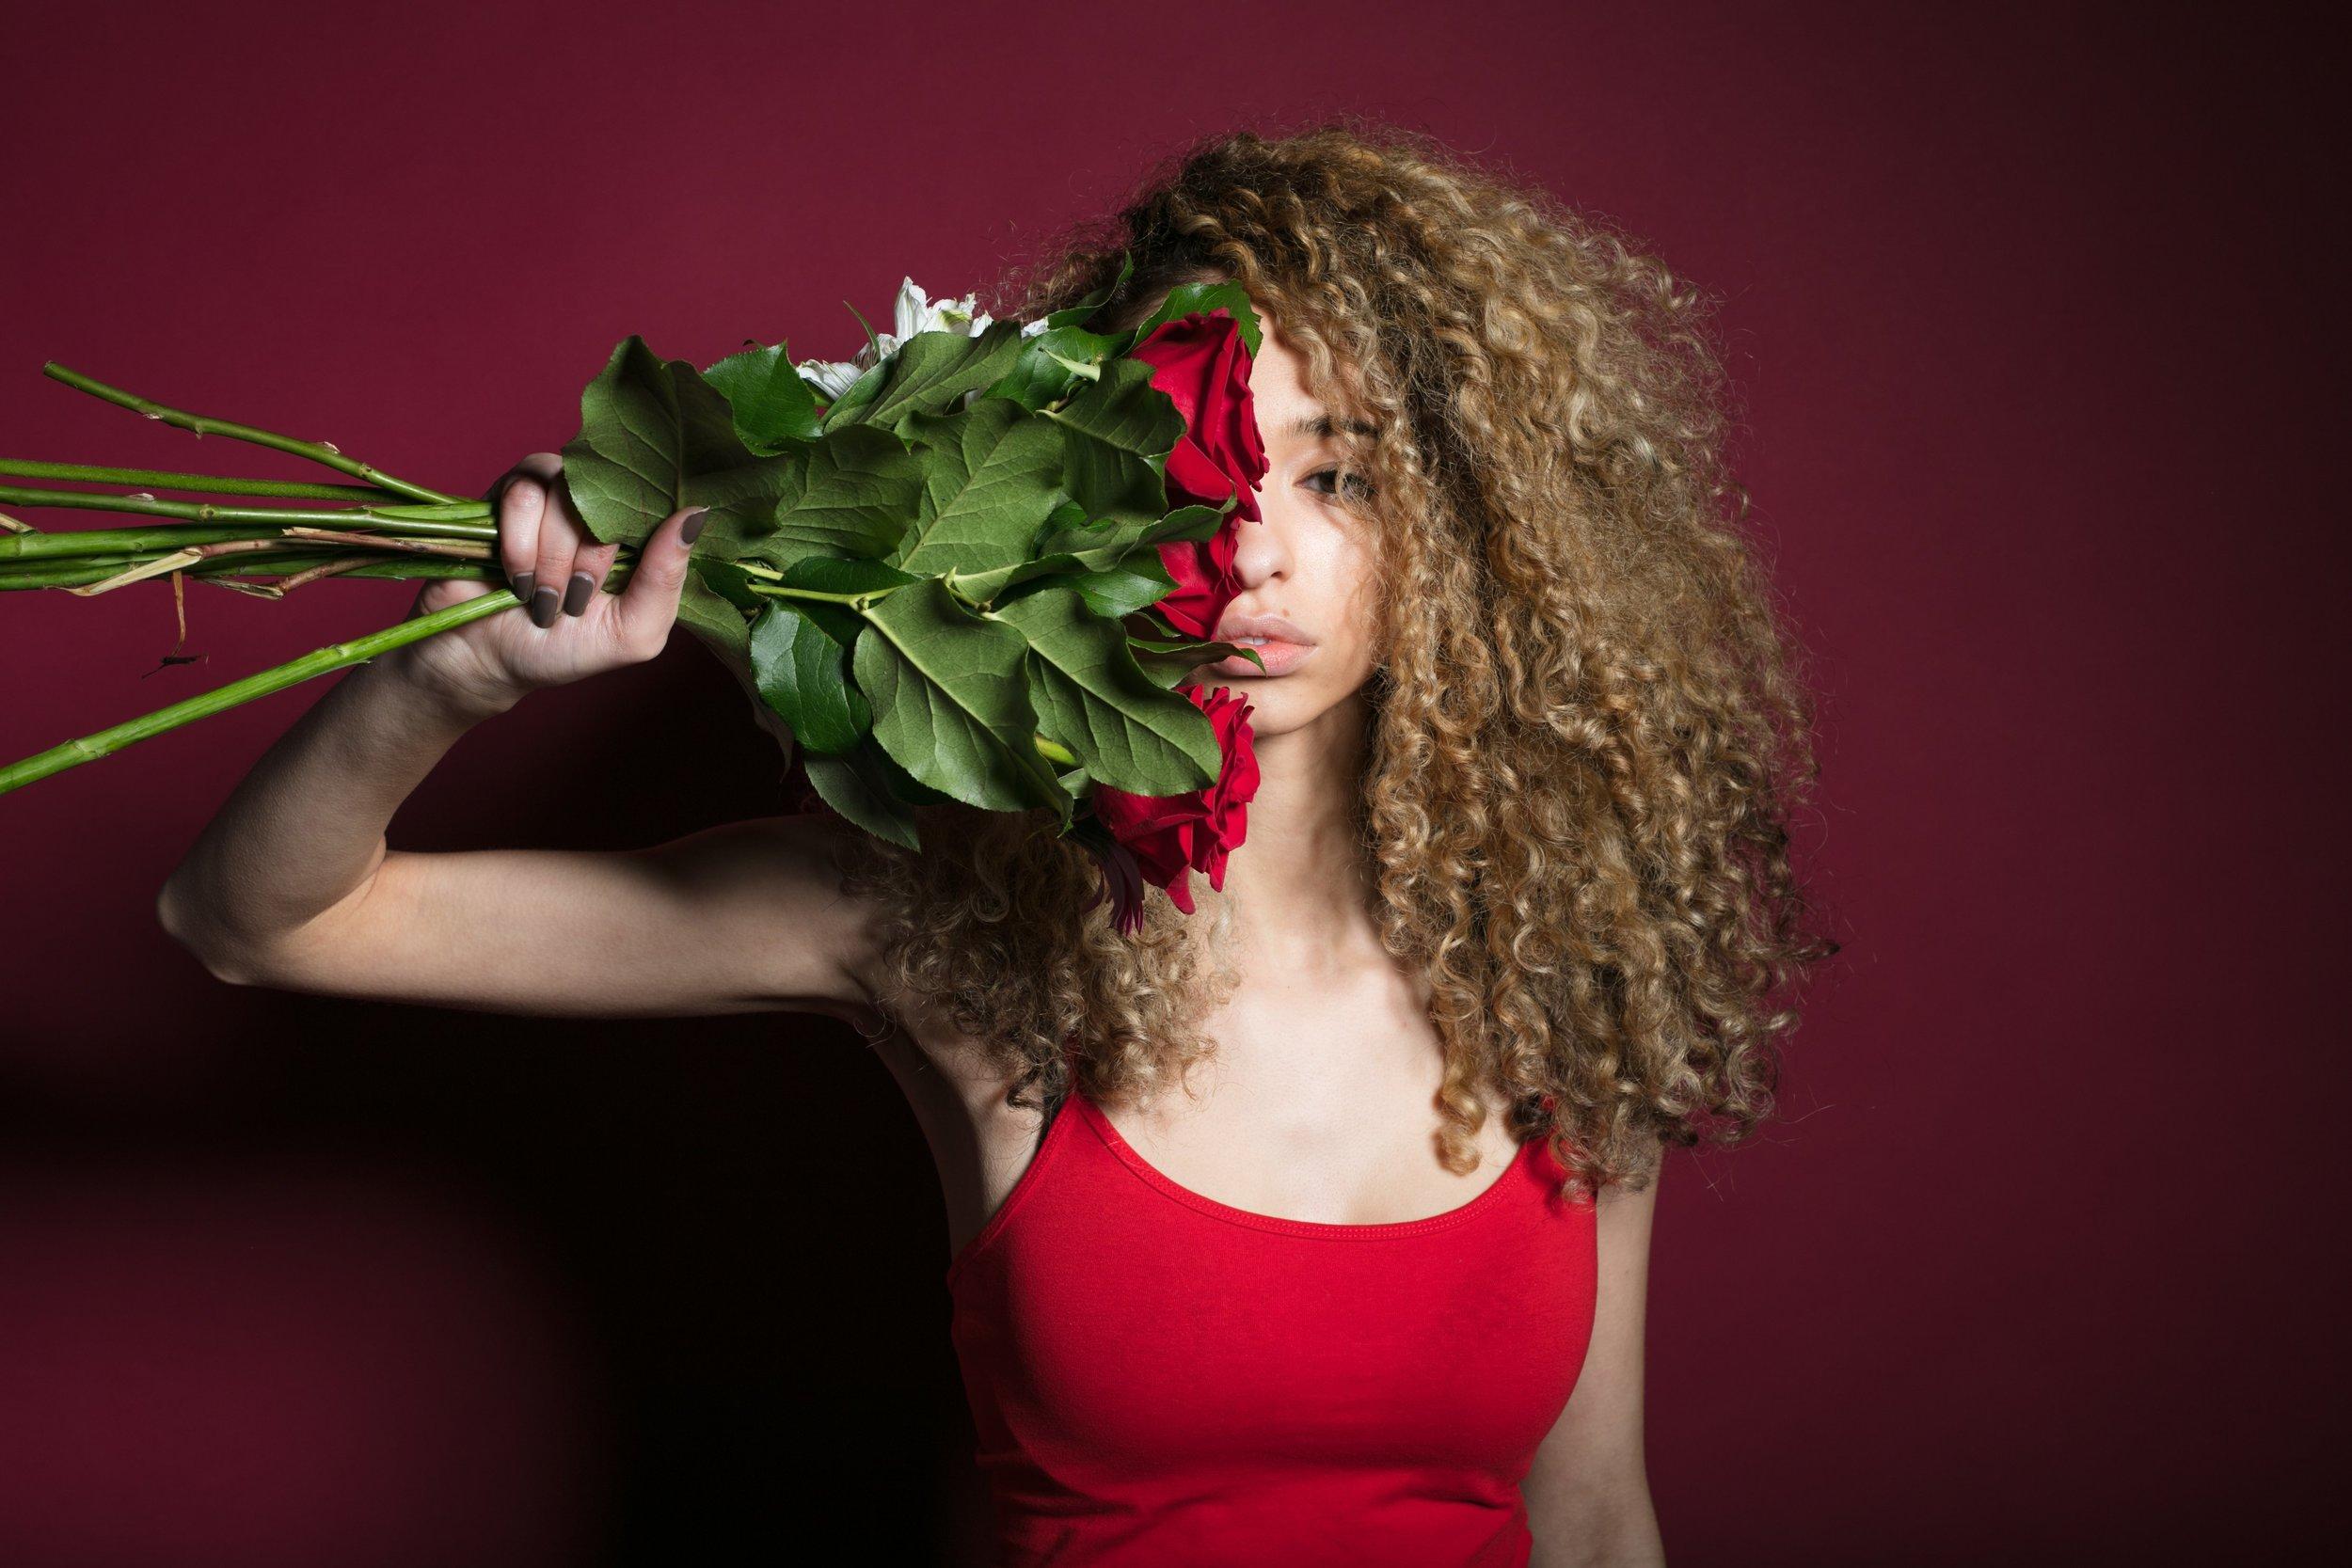 woman-grasping-flowers_4460x4460.jpg